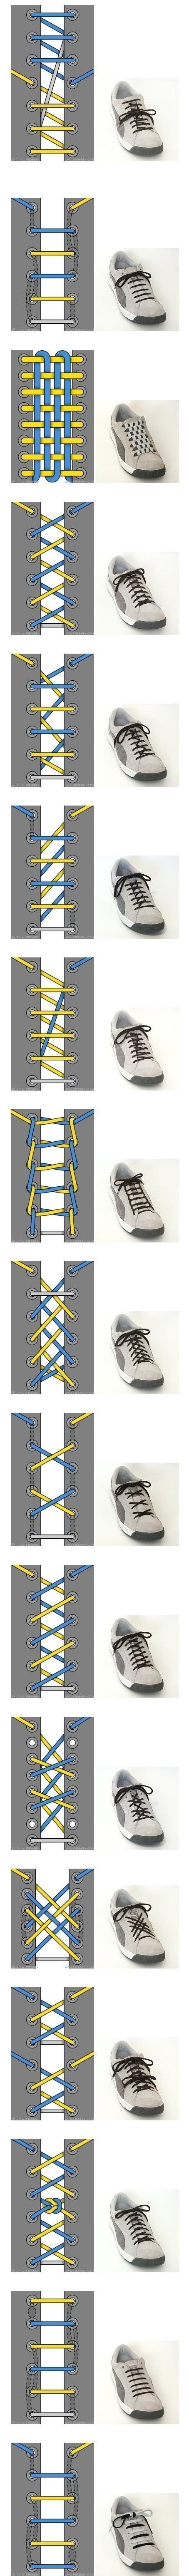 17 ways to tie shoe laces